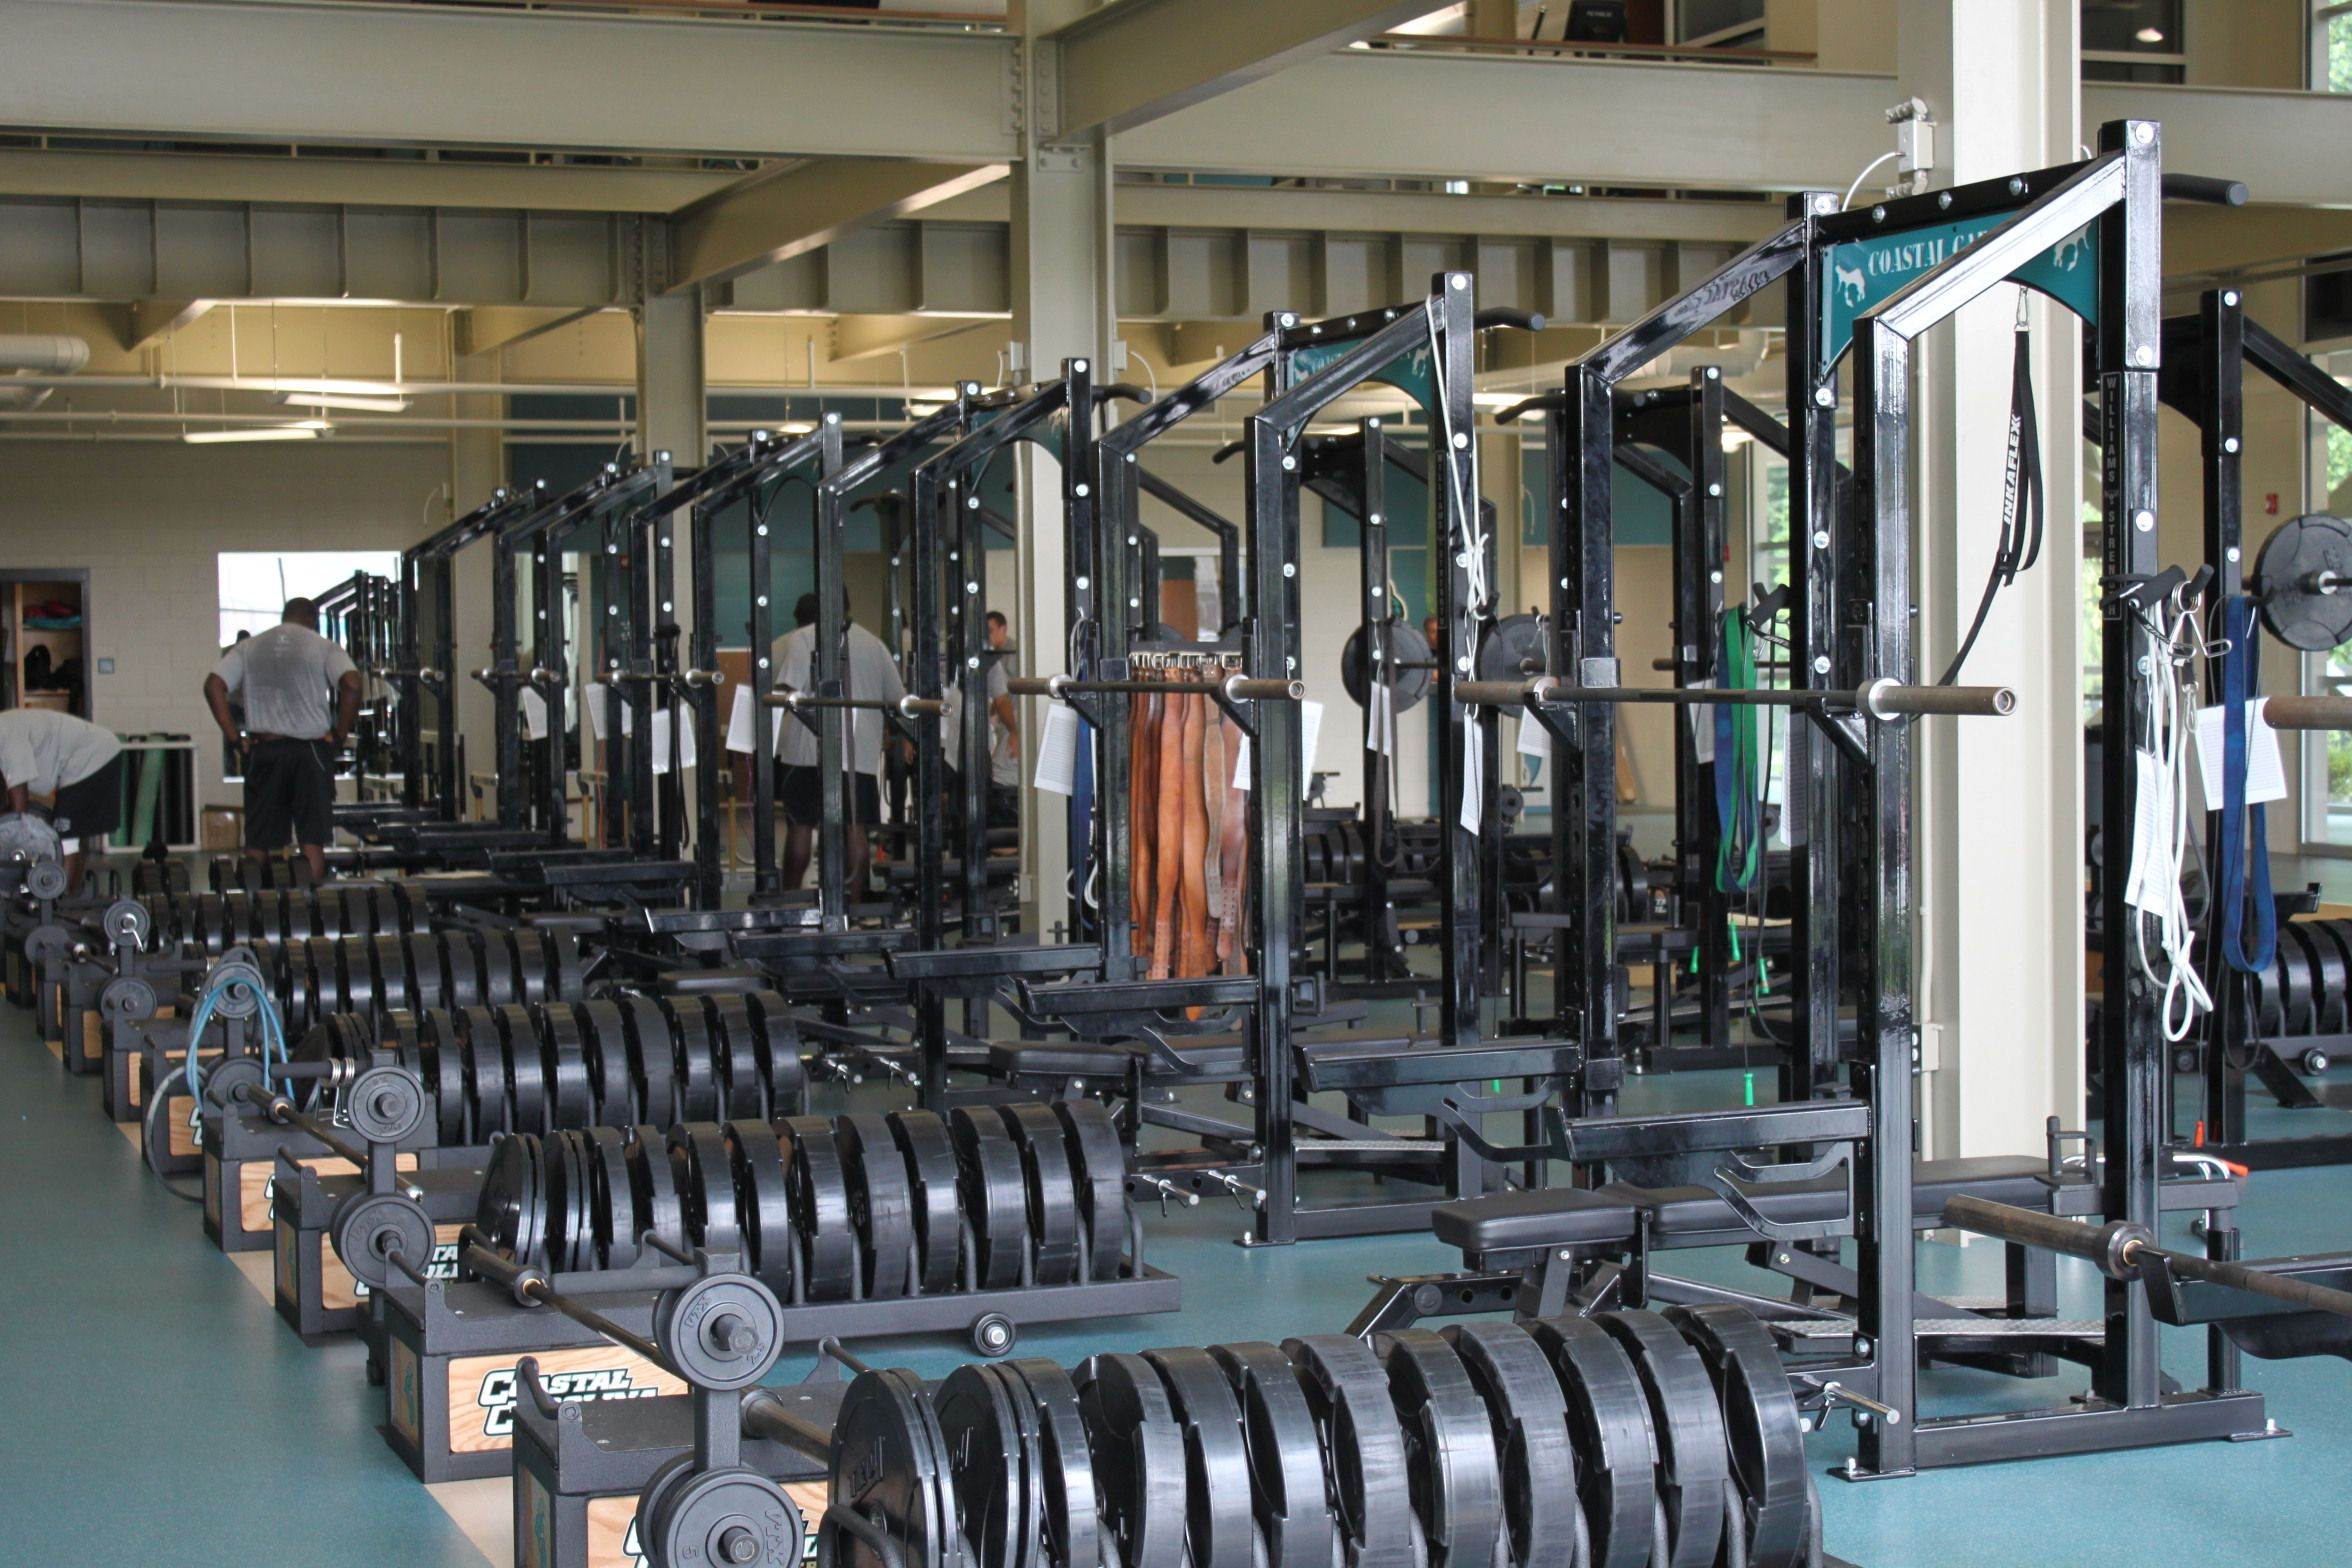 Coastal Carolina Official Athletic Site Facilities Facility Coastal Carolina University Coastal Carolina